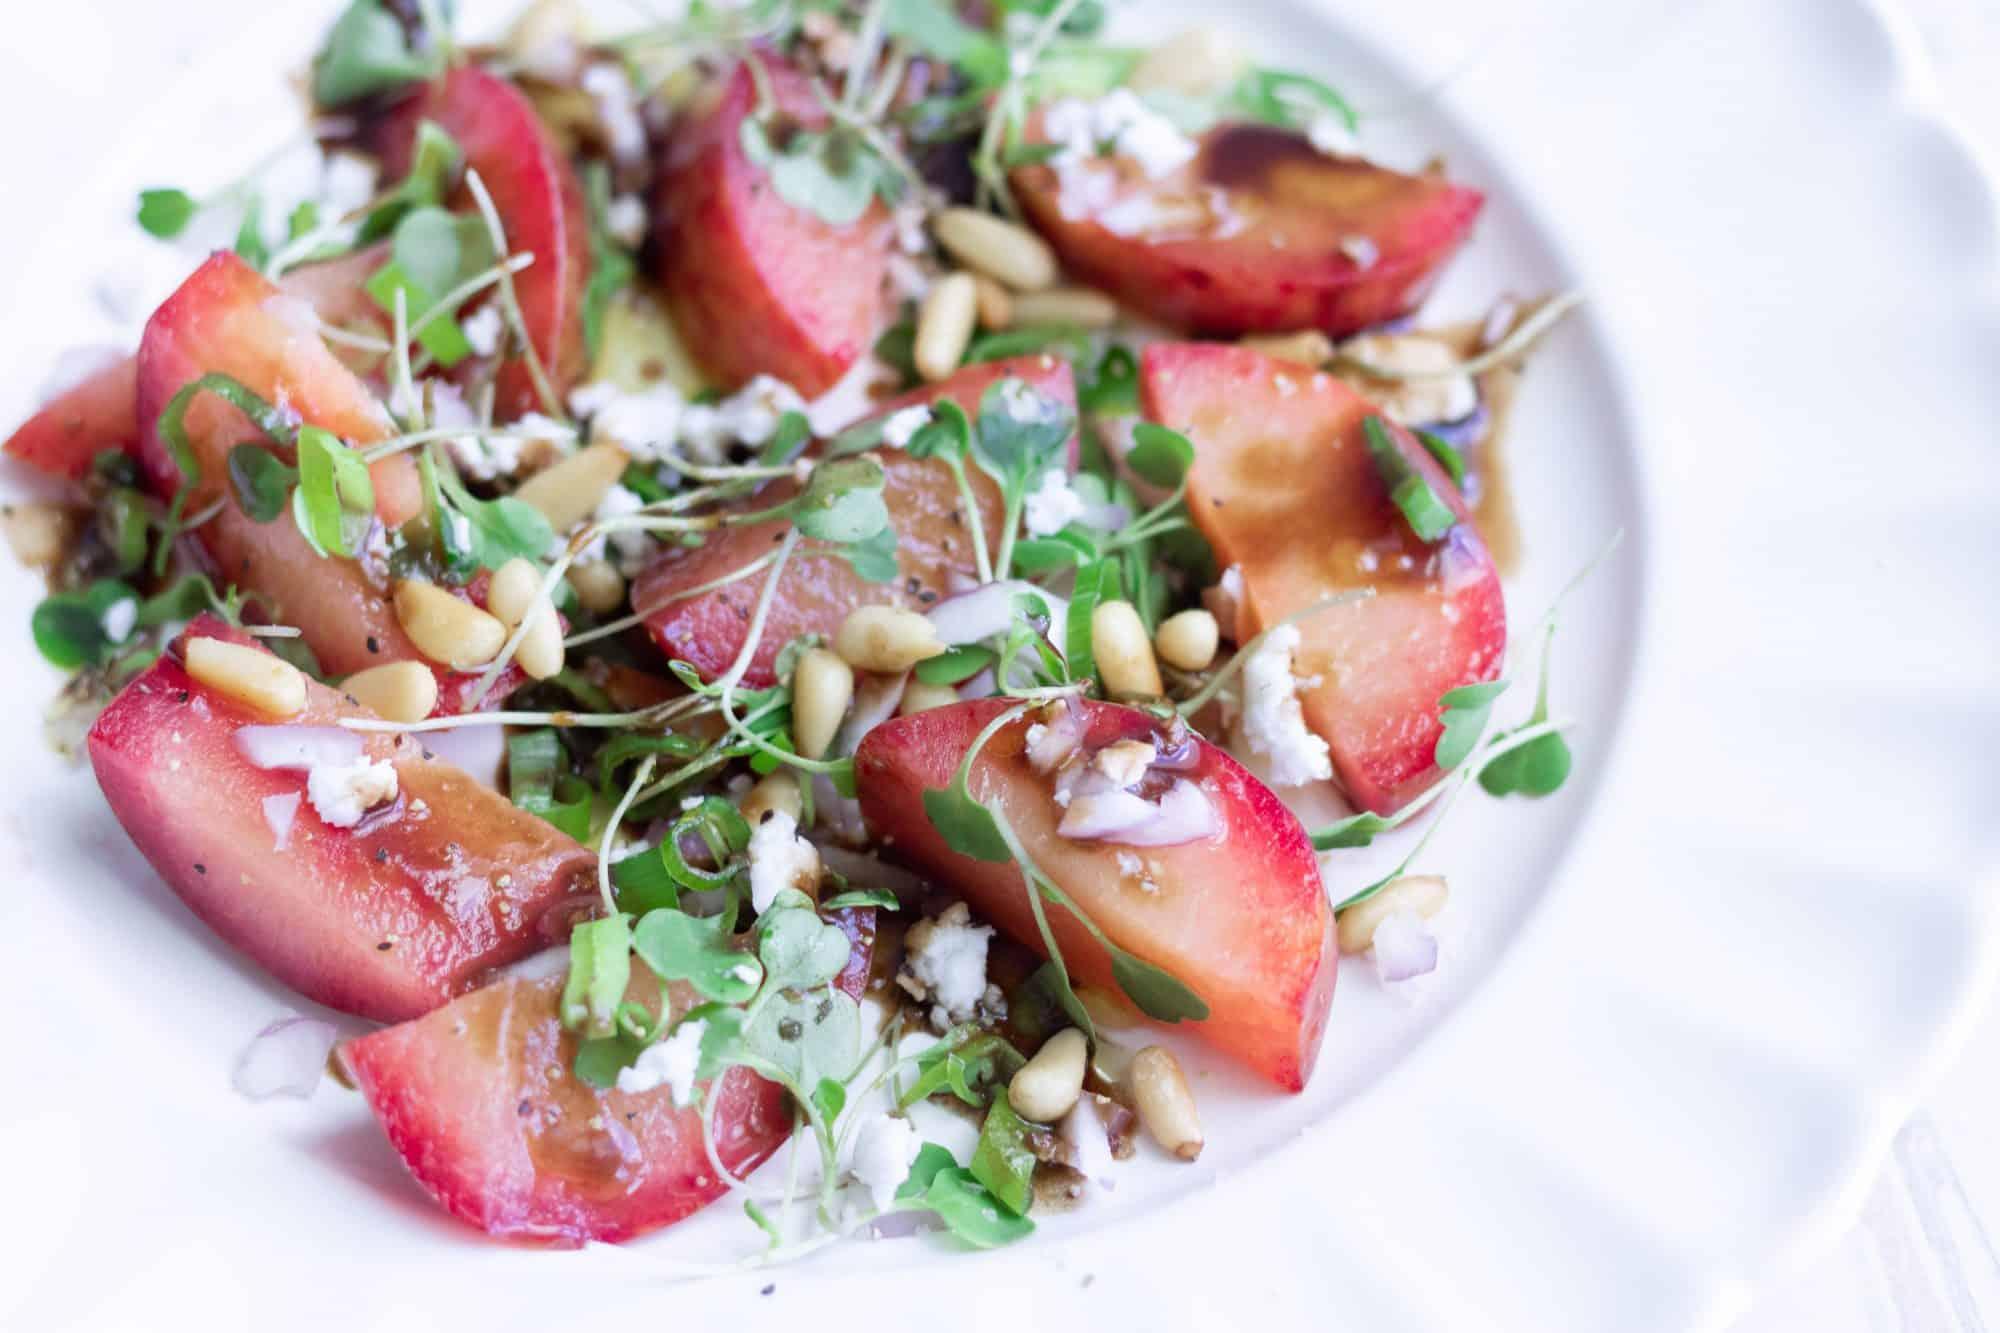 Gluten-Free Plumcot Salad